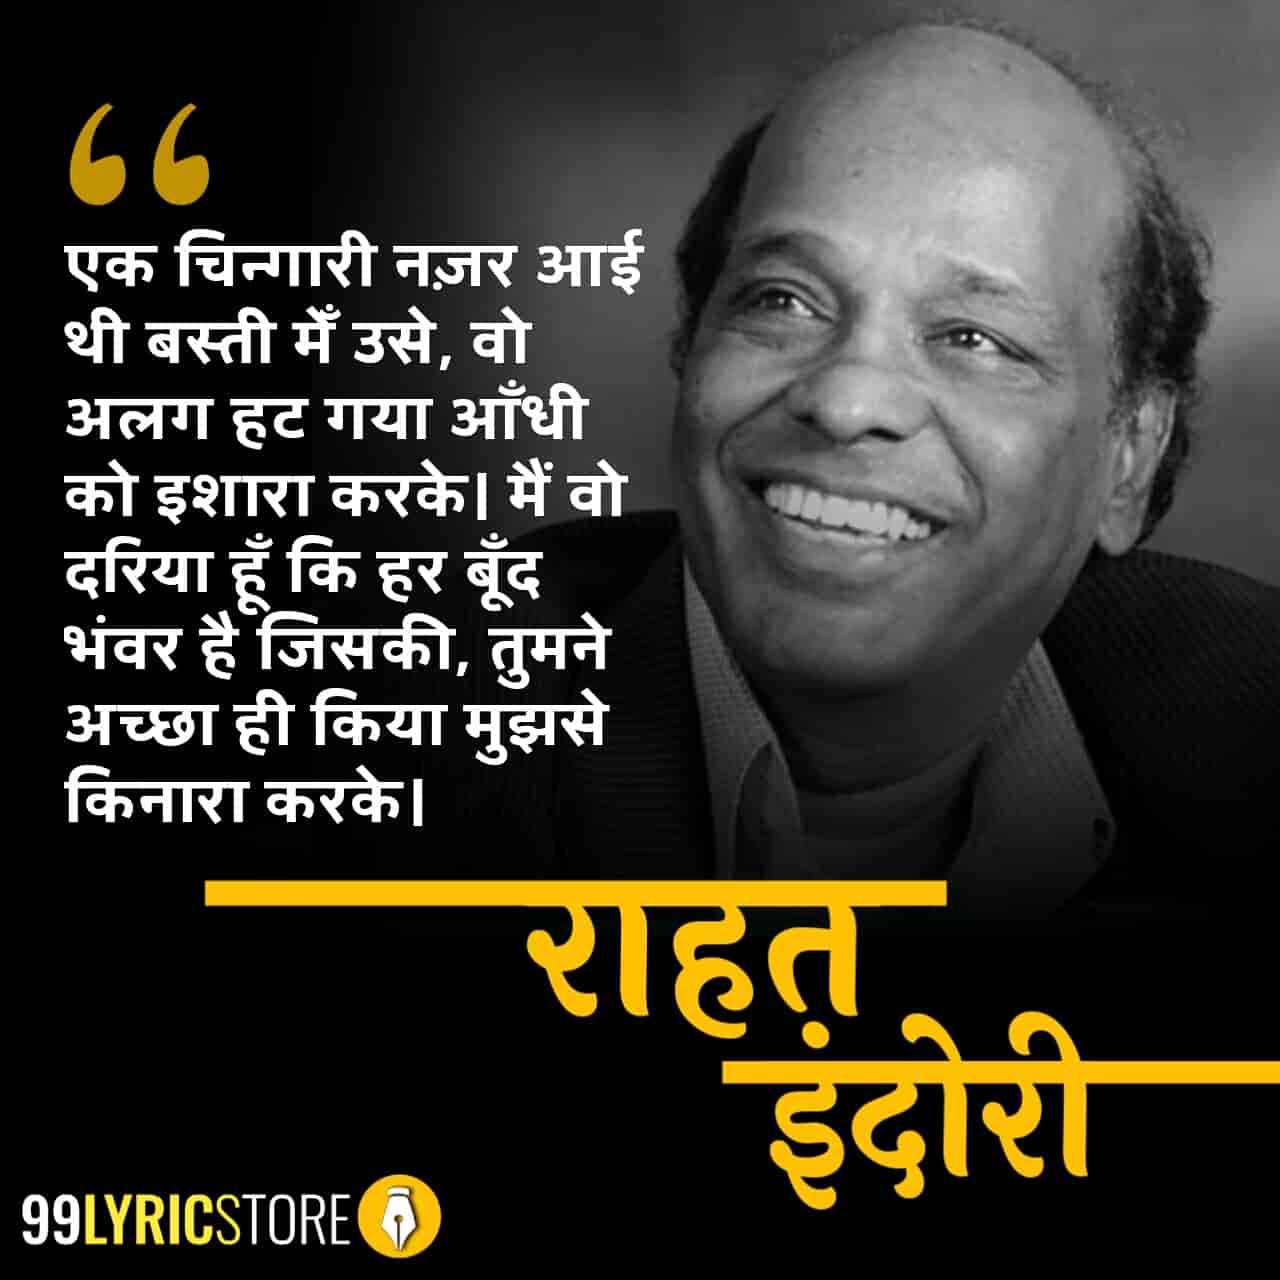 This beautiful ghazal 'Chaand Ko Chhat Pe Bula Lunga Ishaara Karke' has written by Rahat Indori.